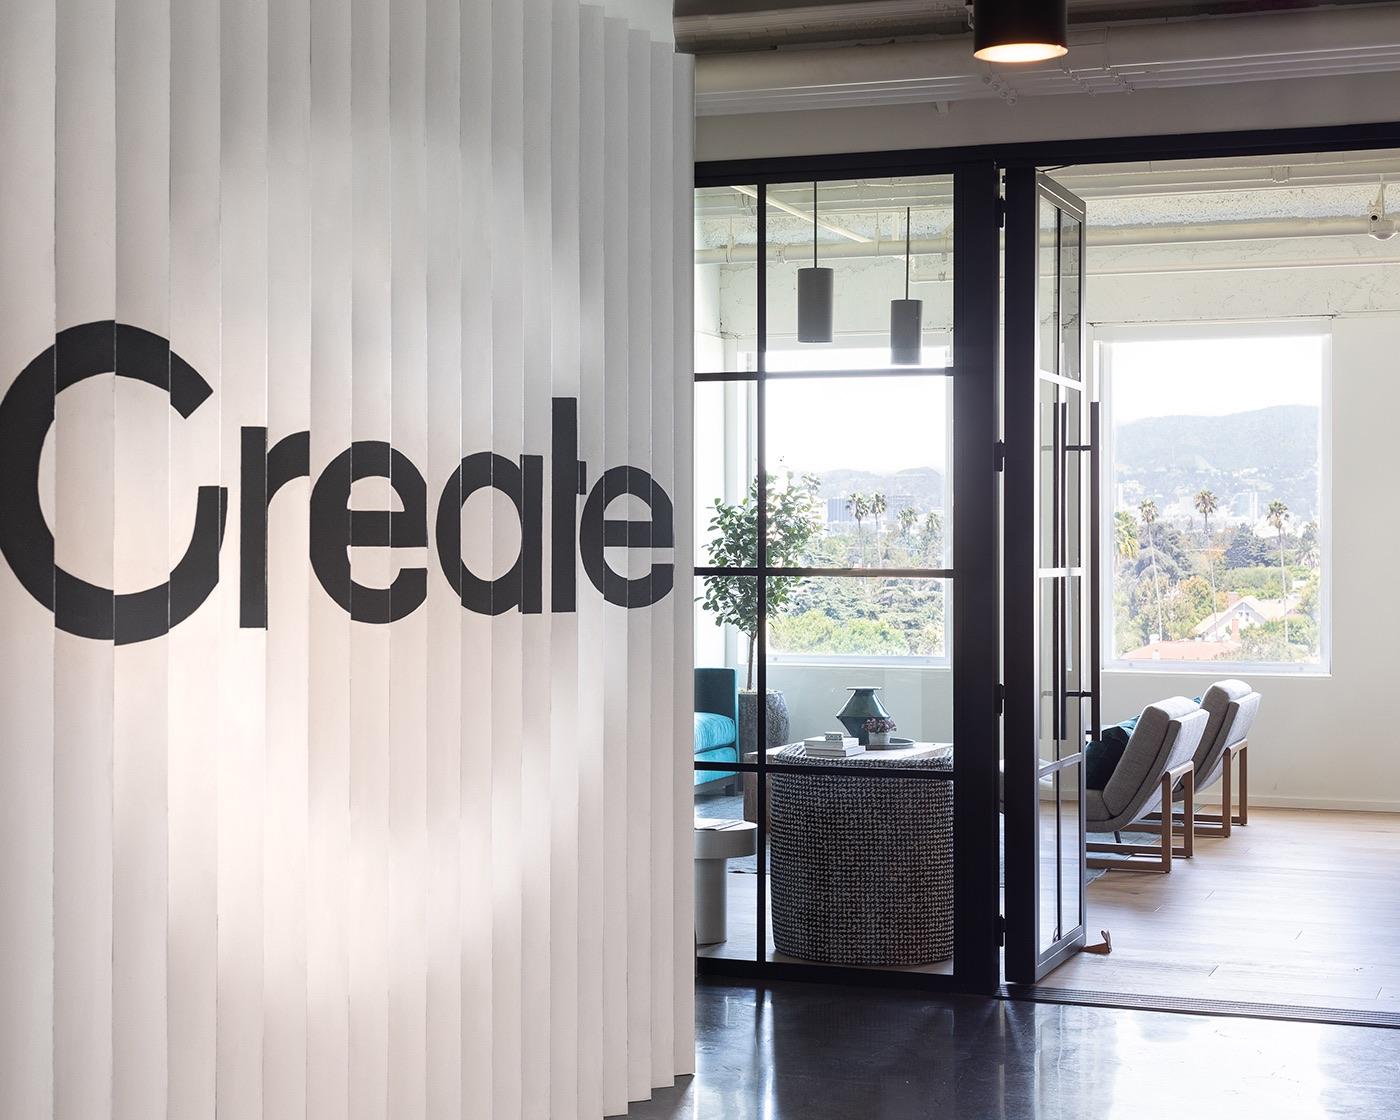 create-advertising-los-angeles-office-1